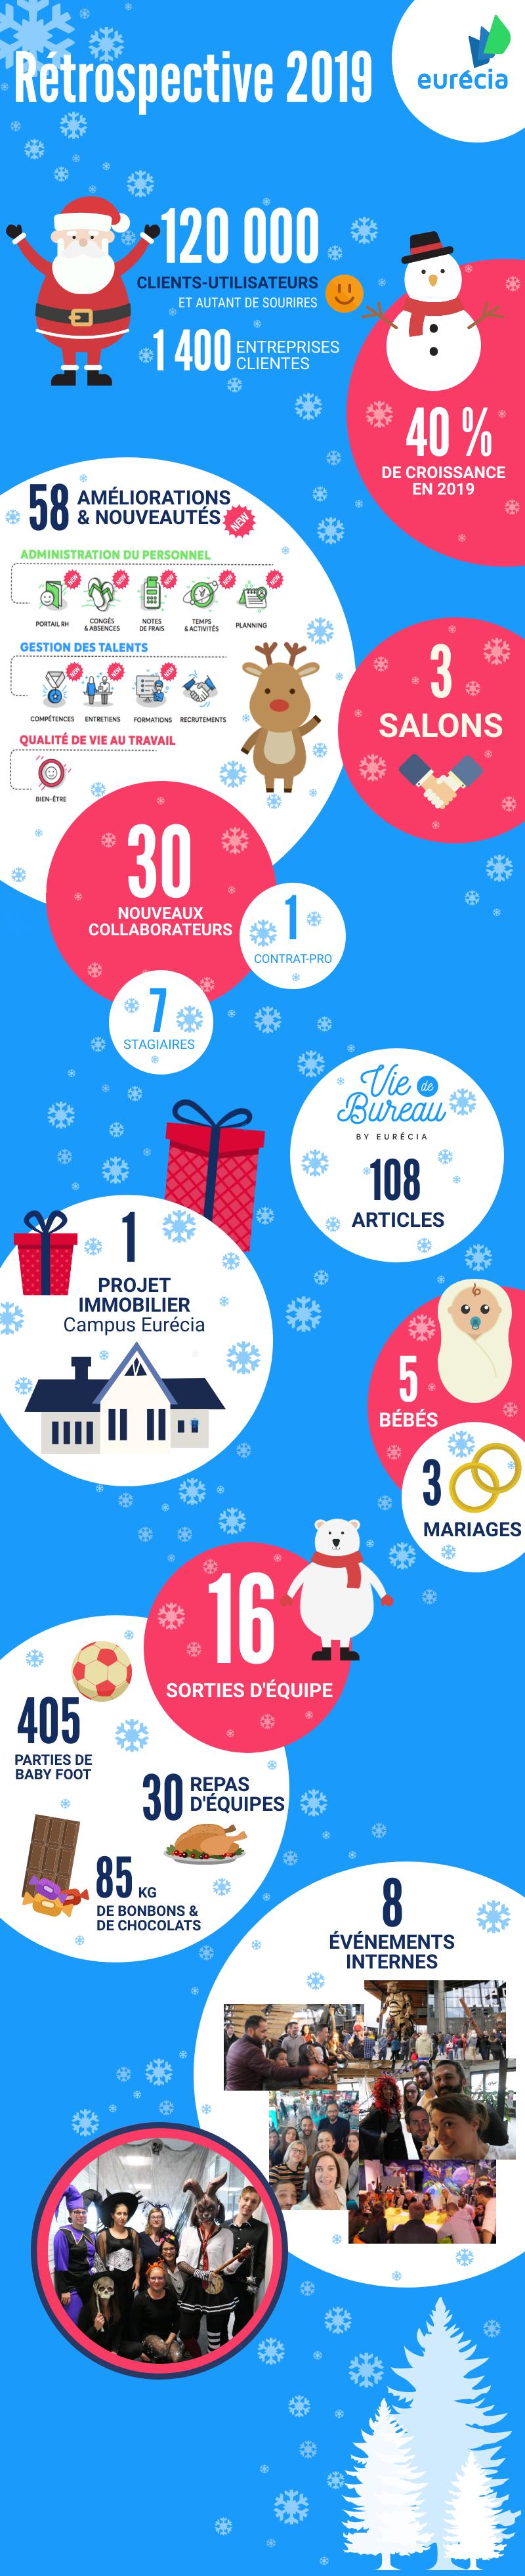 infographie_eurecia_2019.png